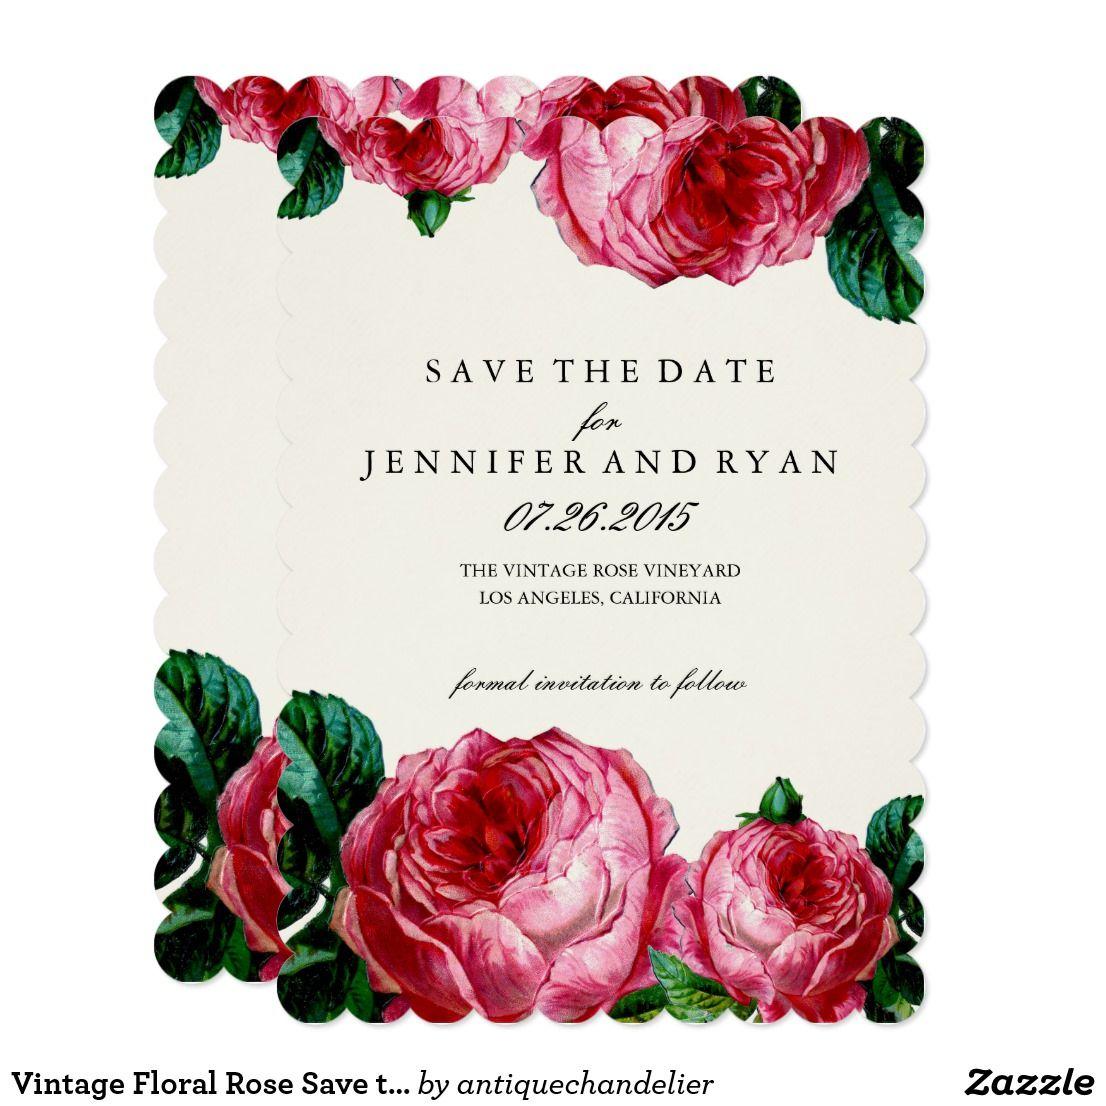 Vintage Floral Rose Save the Date | Zazzle.com | Wedding ...